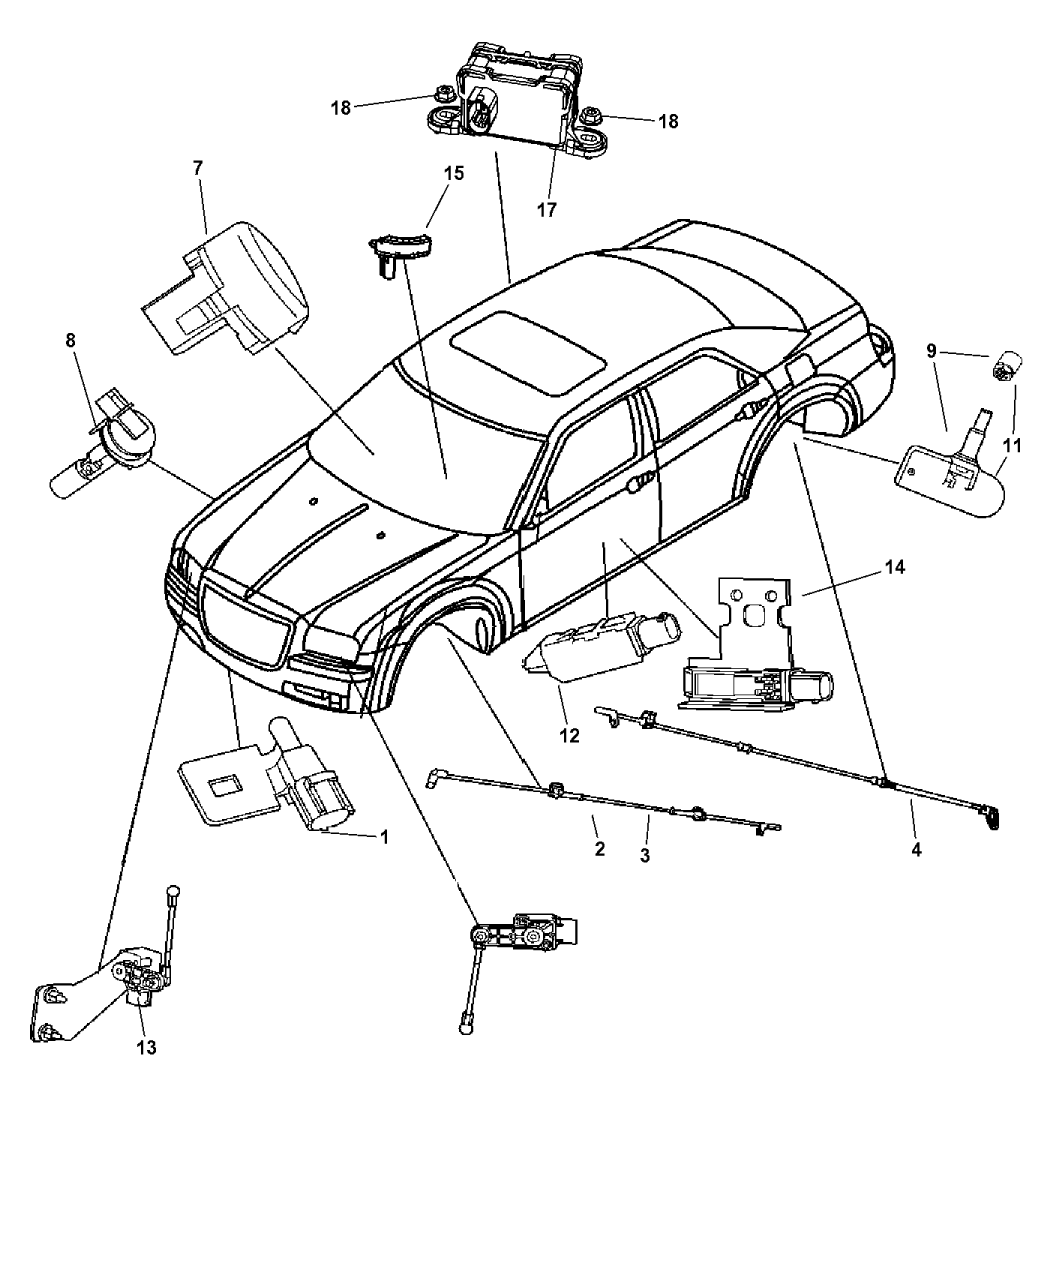 2007 Dodge Charger Sensors Body Mopar Parts Giant Tail Light Wiring Diagram